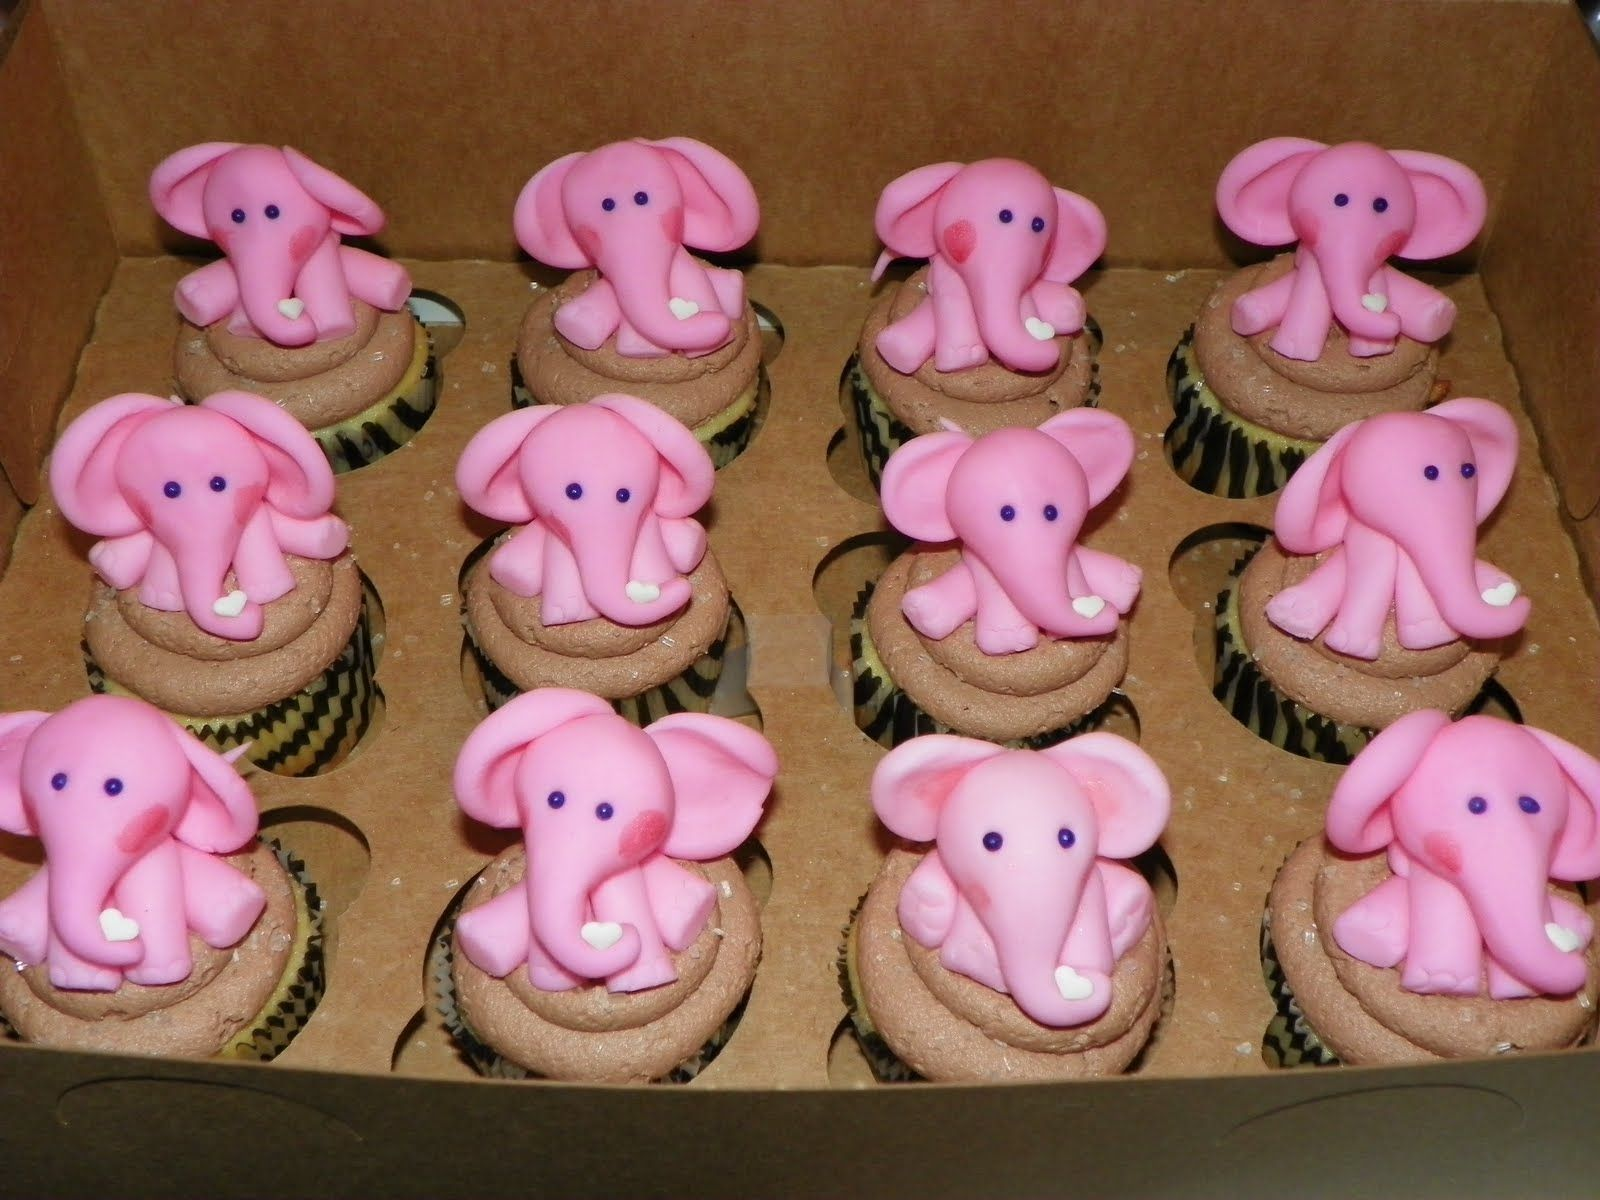 die besten 25 elefanten cupcakes ideen auf pinterest elefanten kuchen fondant elefant. Black Bedroom Furniture Sets. Home Design Ideas